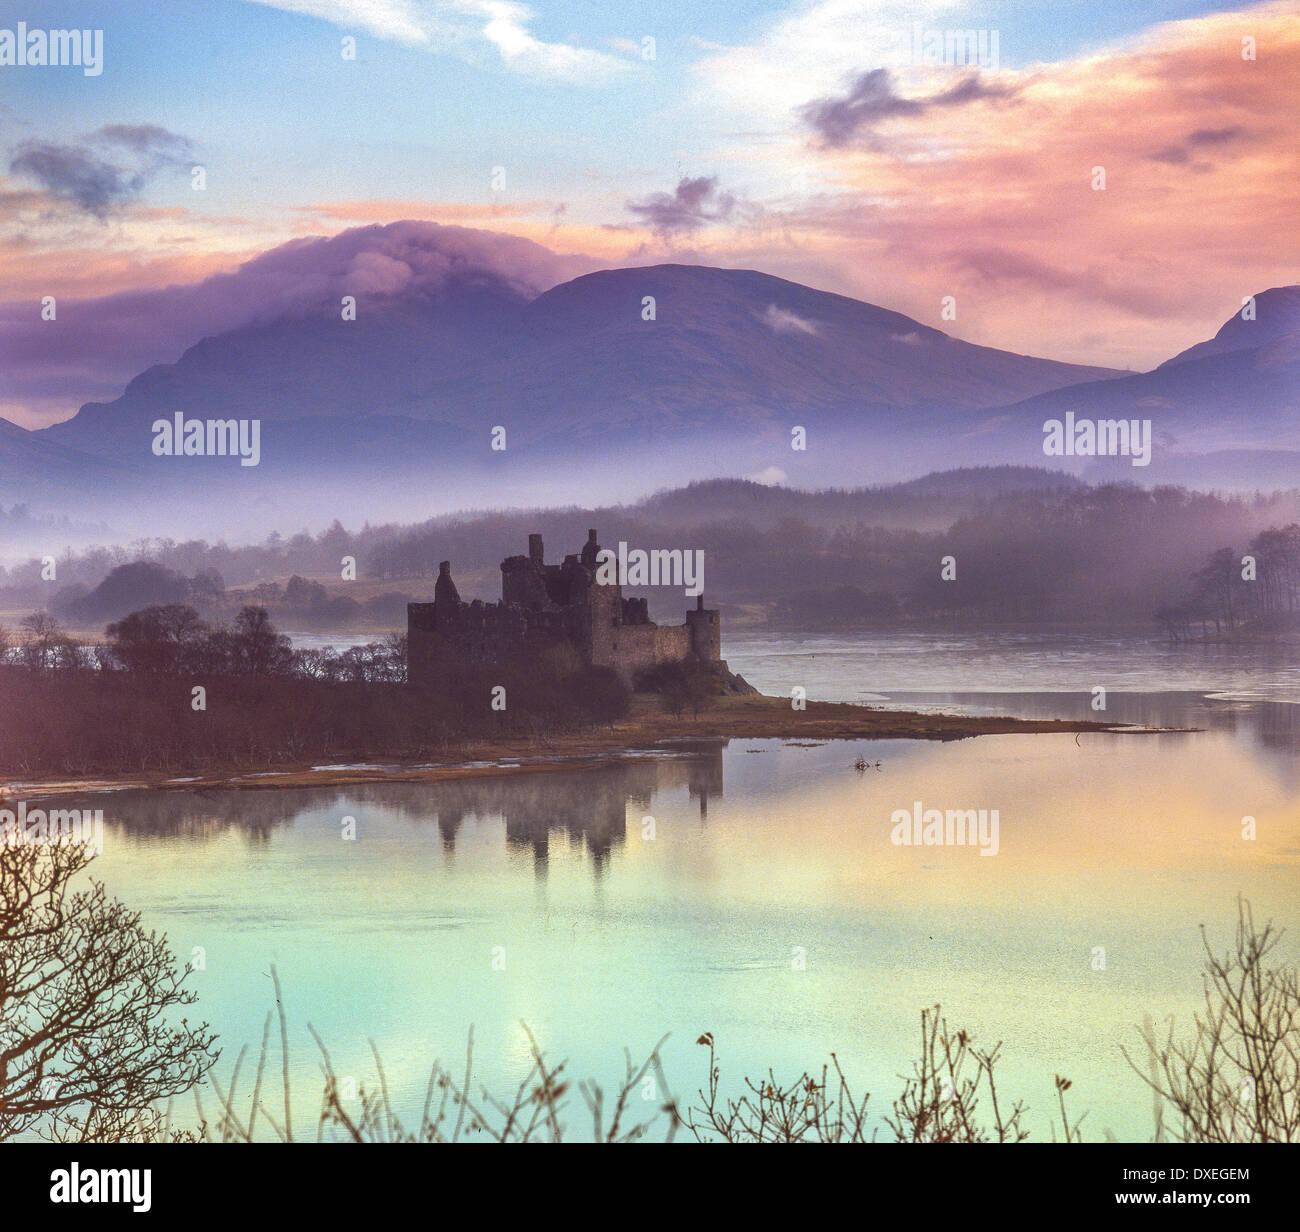 Kilchurn castle, Loch Awe, Argyll - Stock Image